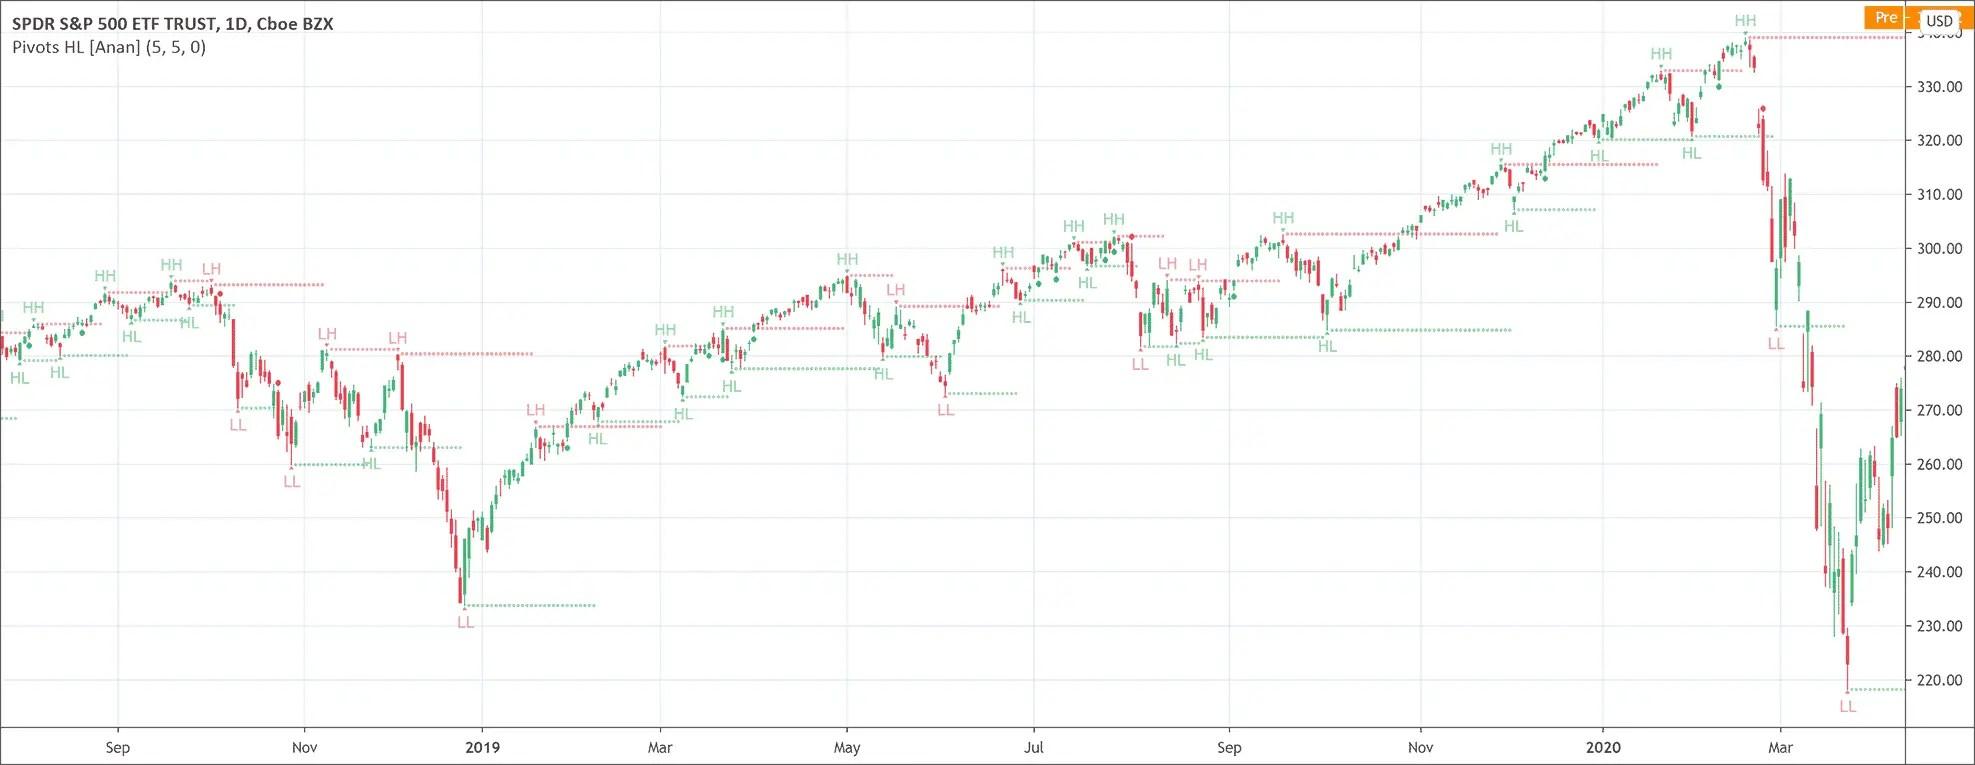 Pivot Point High/Low